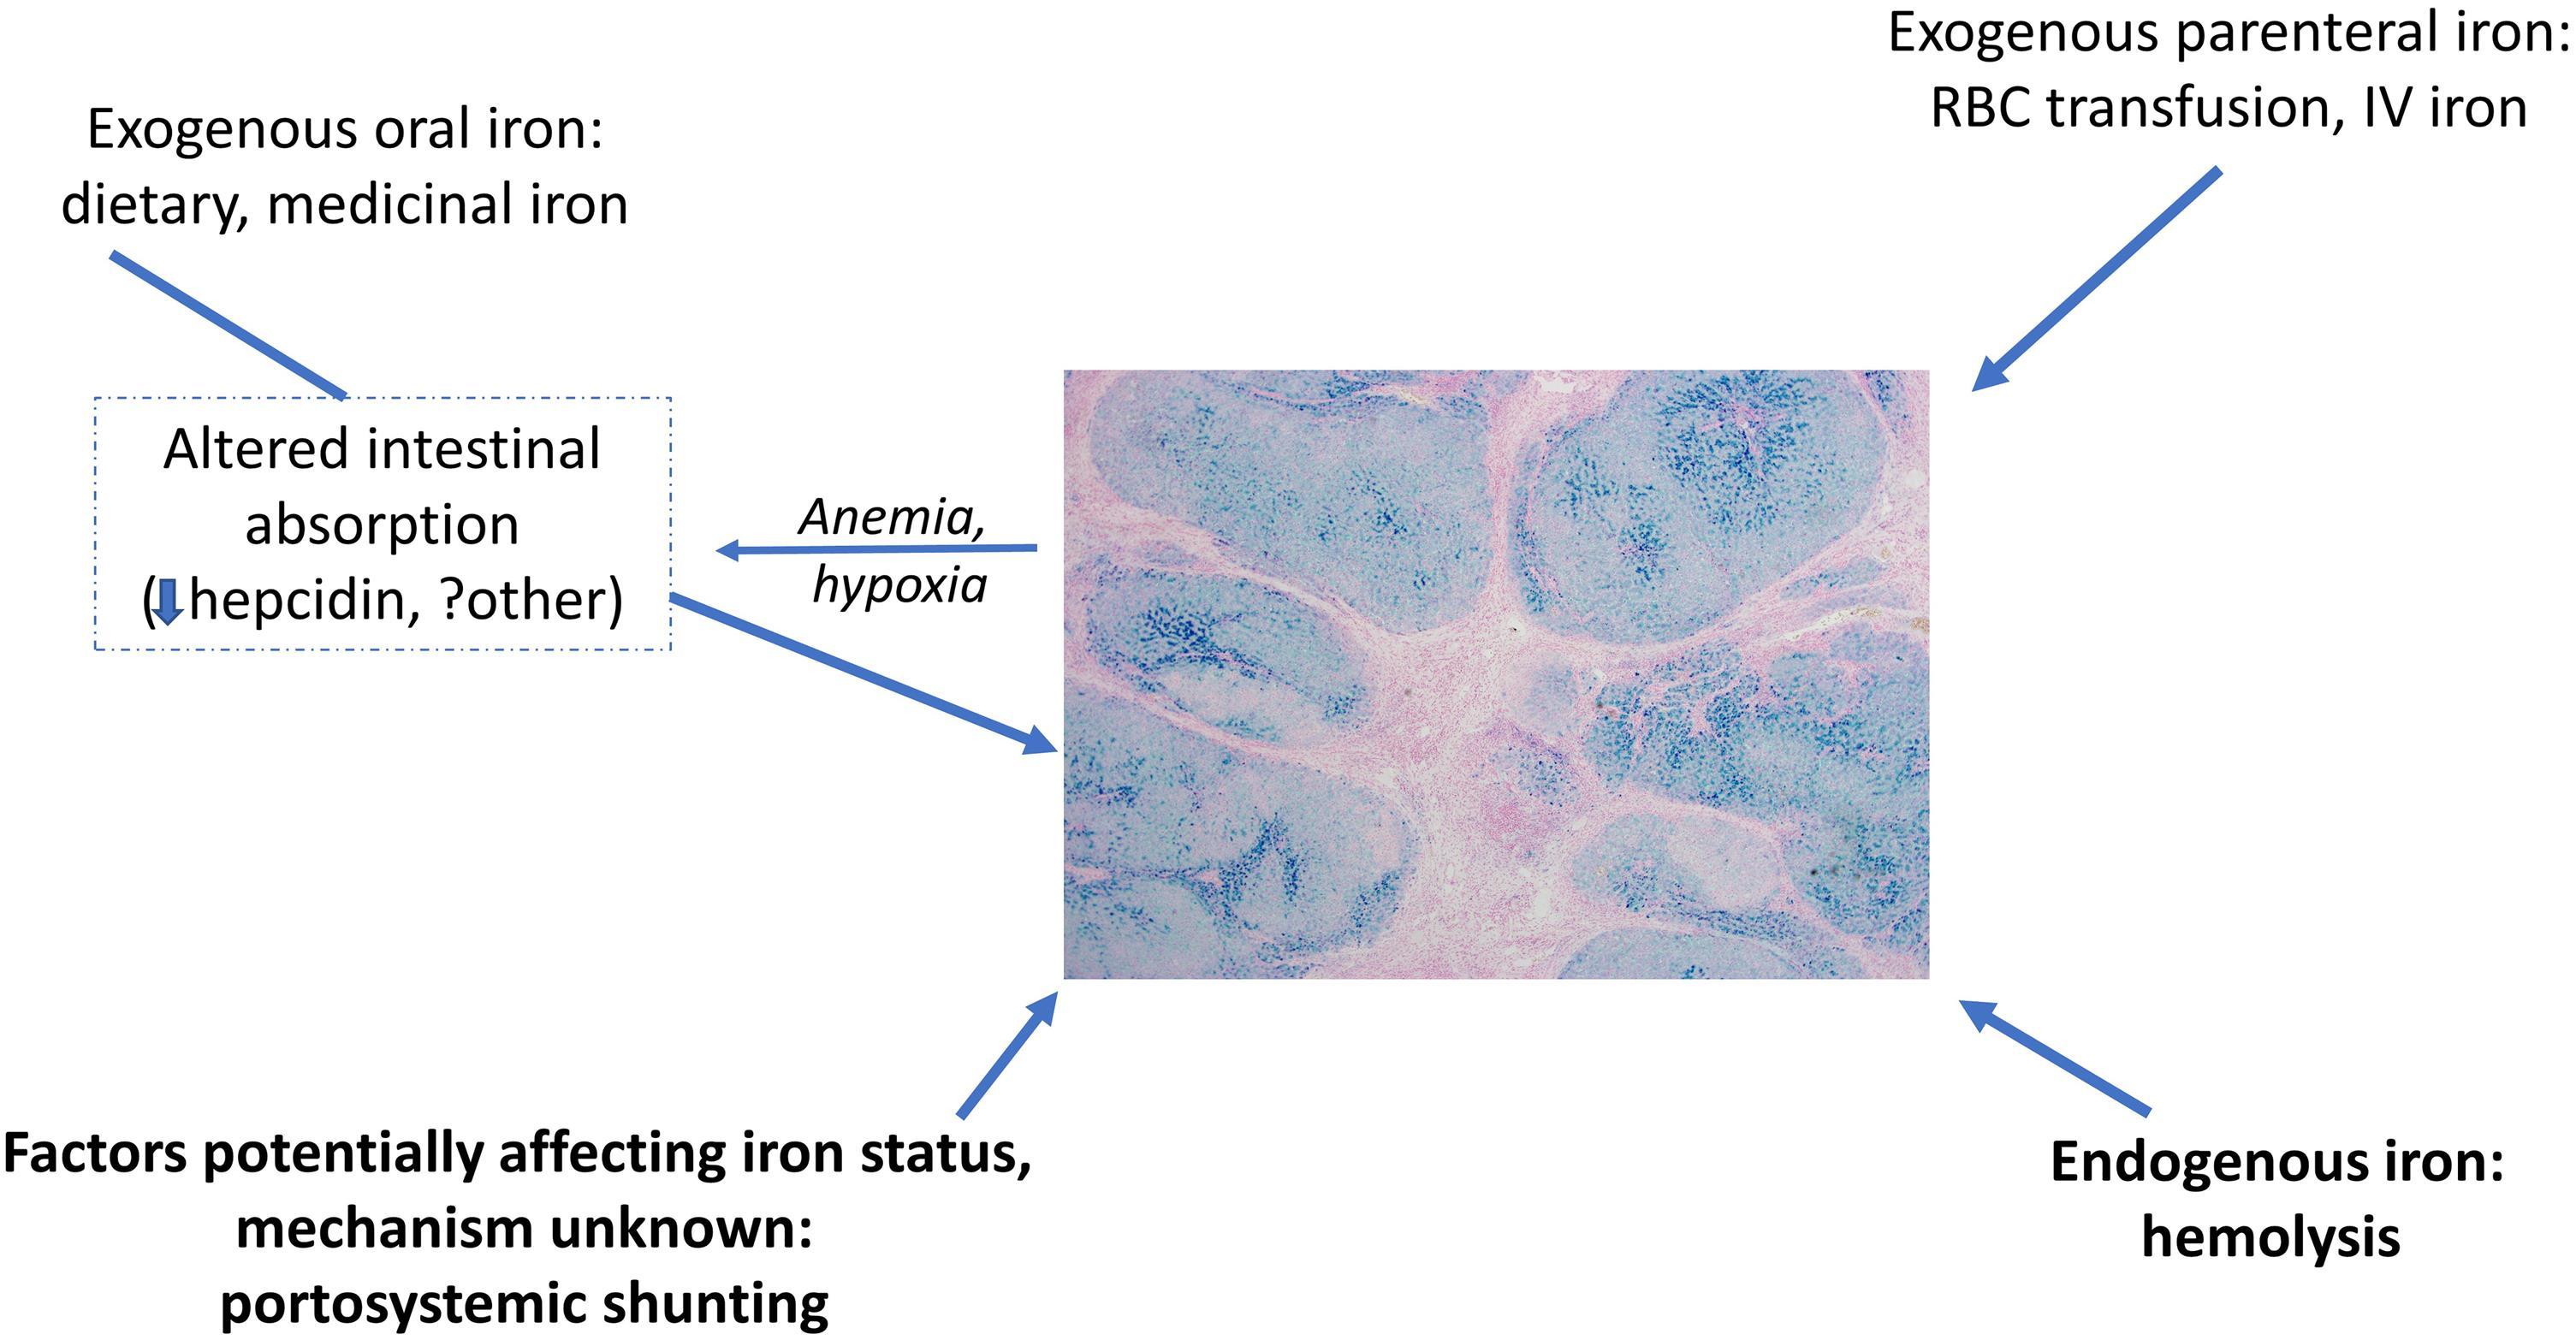 Potential contributors to hepatocellular iron deposition in cirrhosis.